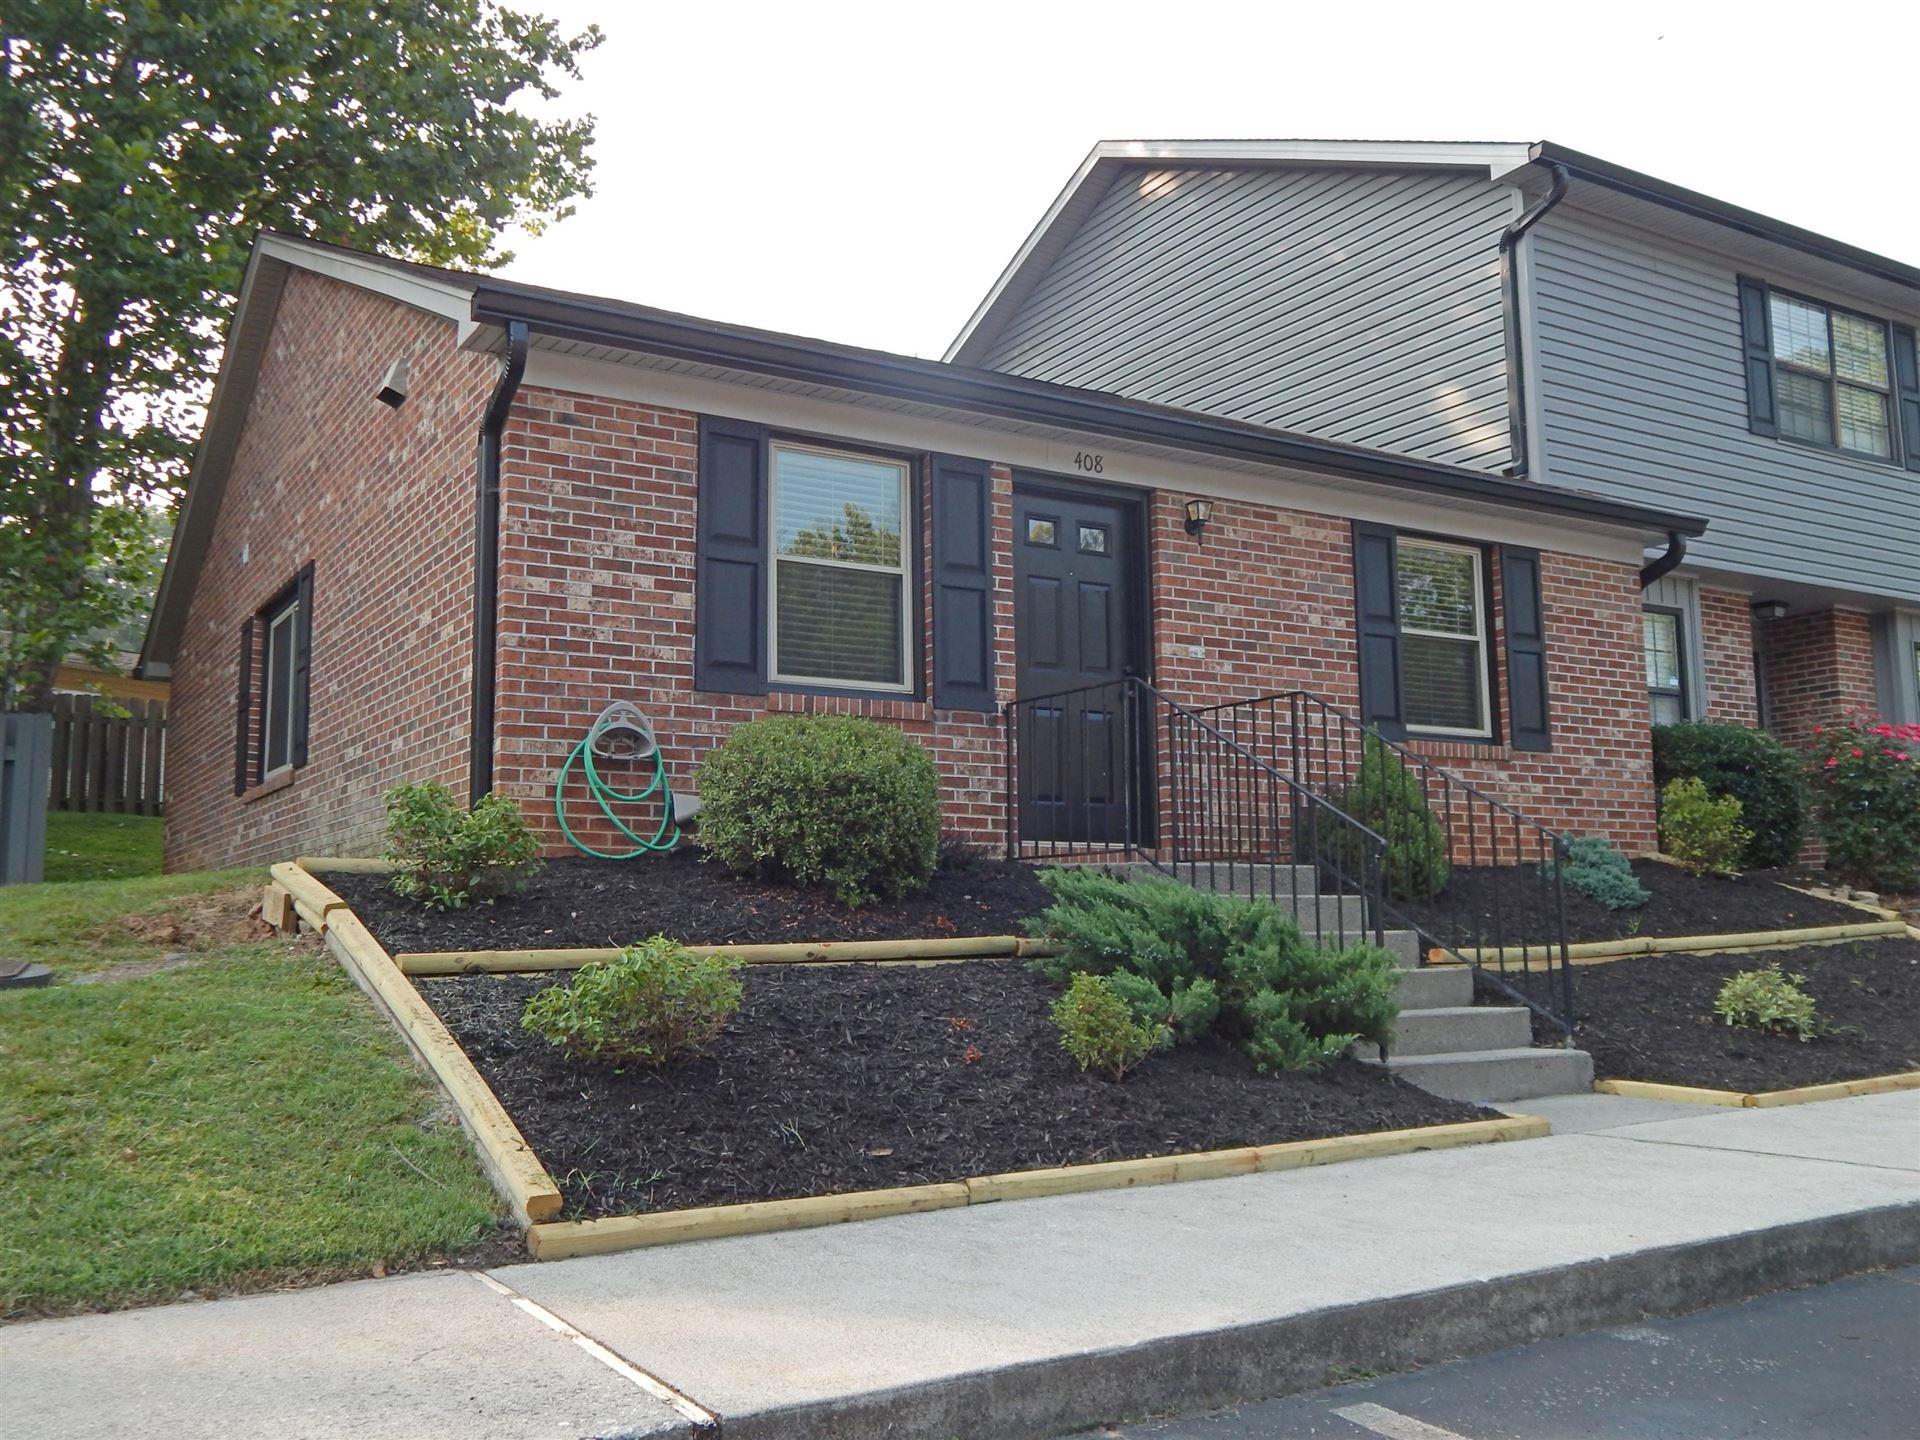 408 Amanda Circle, Knoxville, TN 37922 - MLS#: 1161554